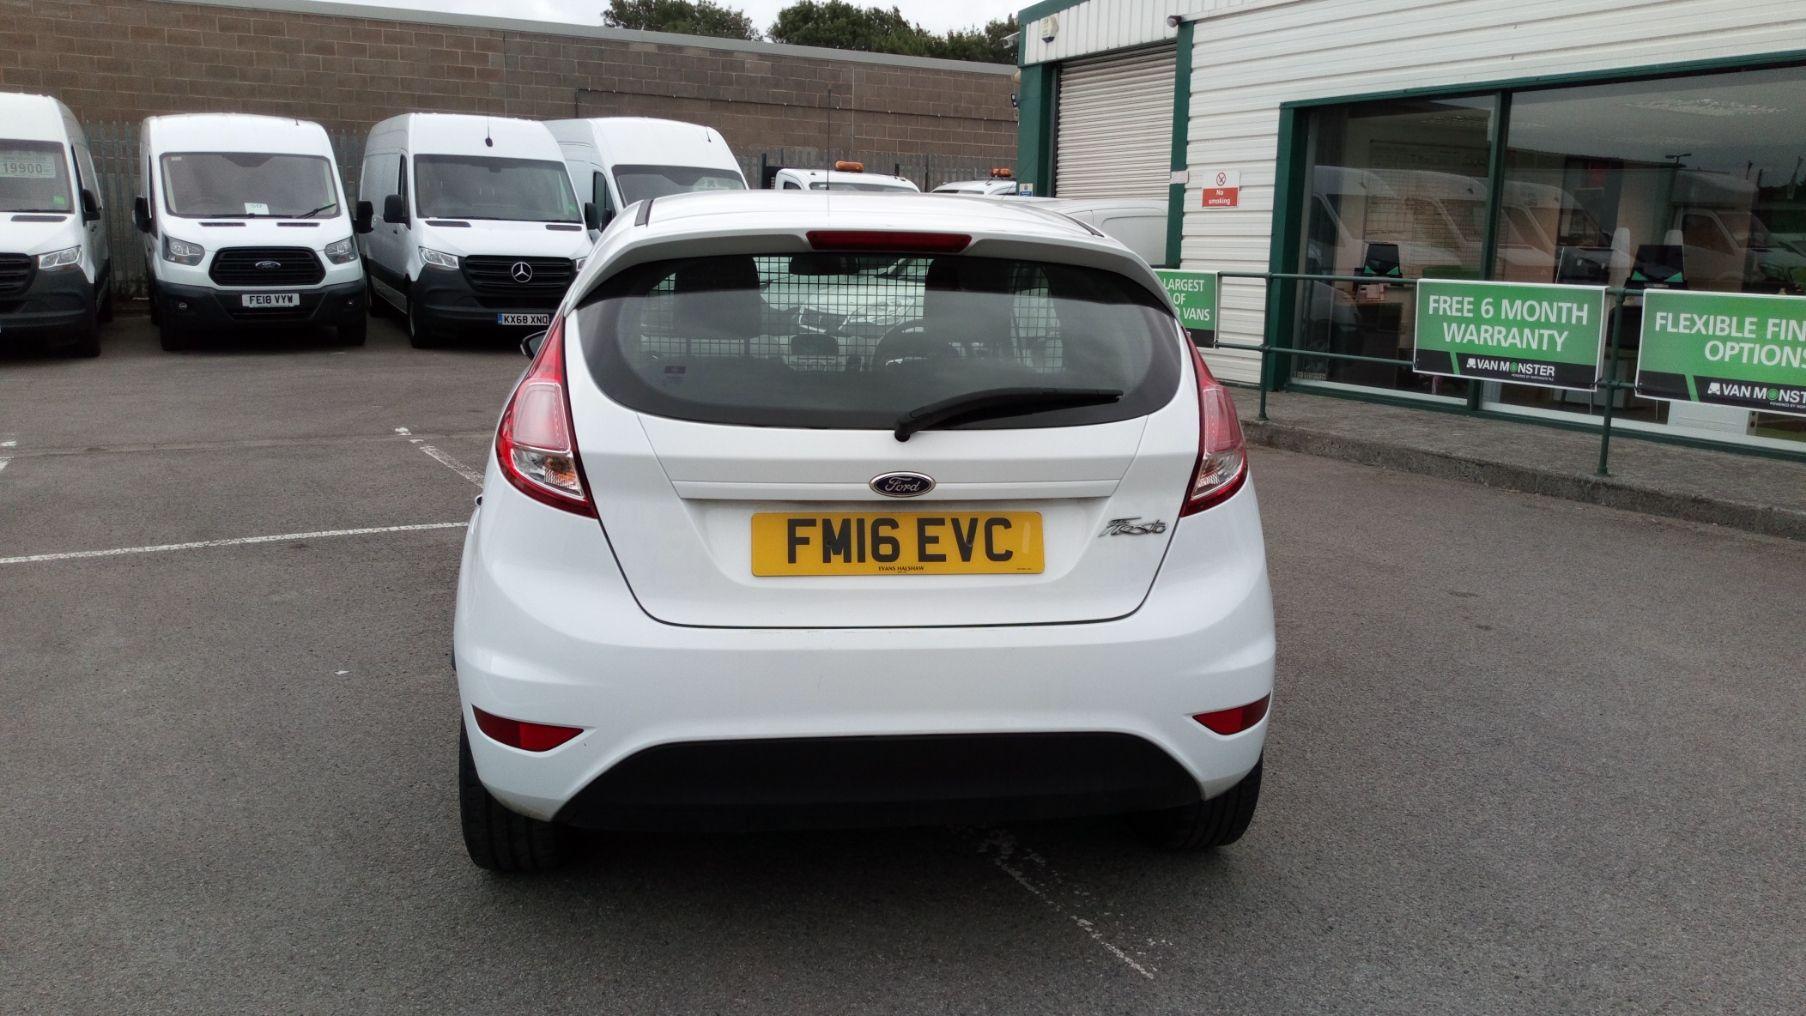 2016 Ford Fiesta 1.5 Tdci Van (FM16EVC) Image 6